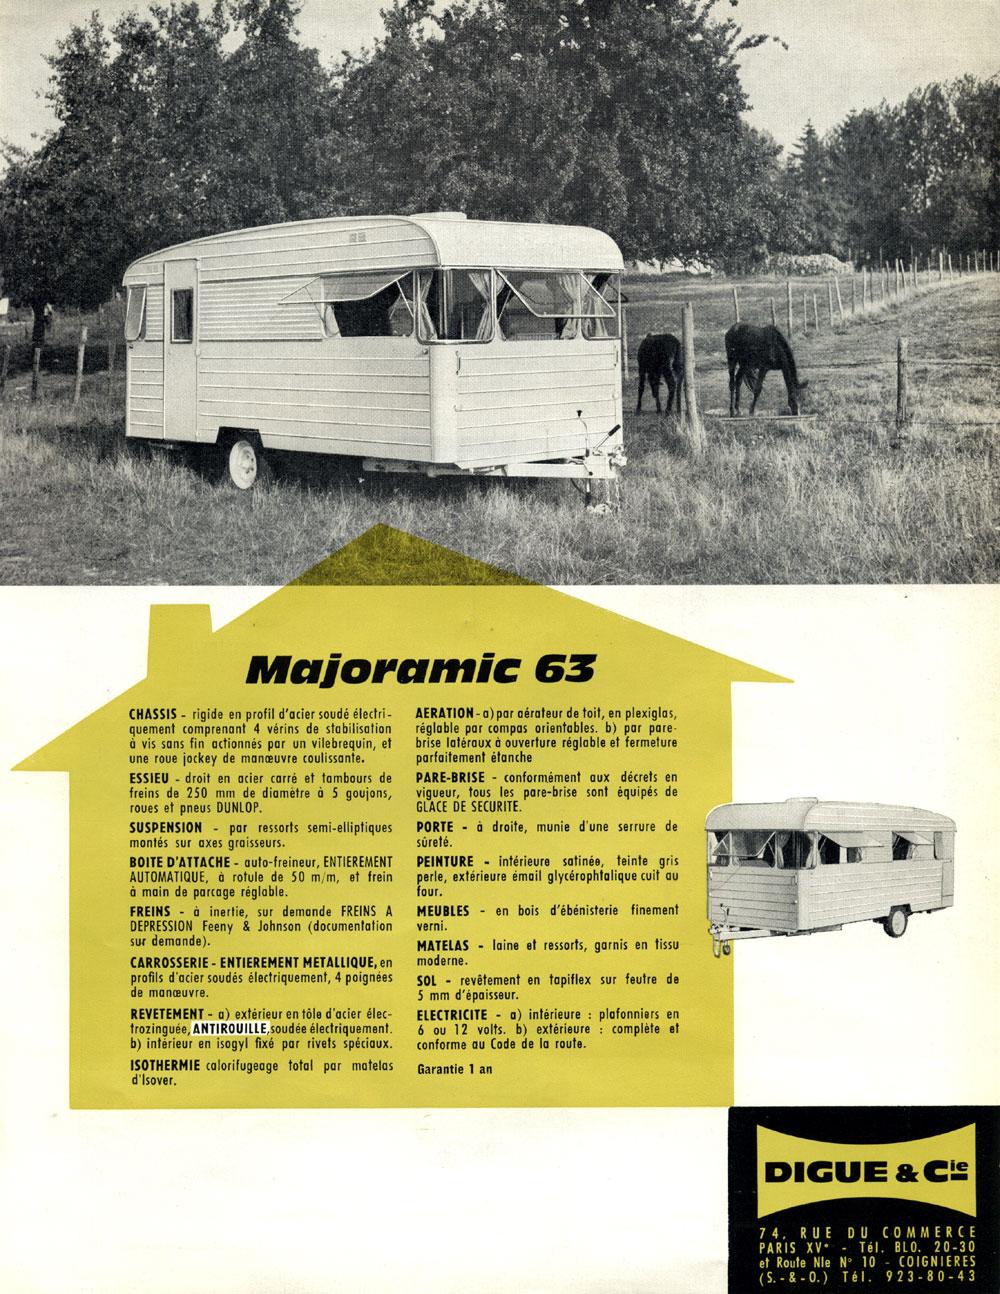 majoramic_63-C.jpg